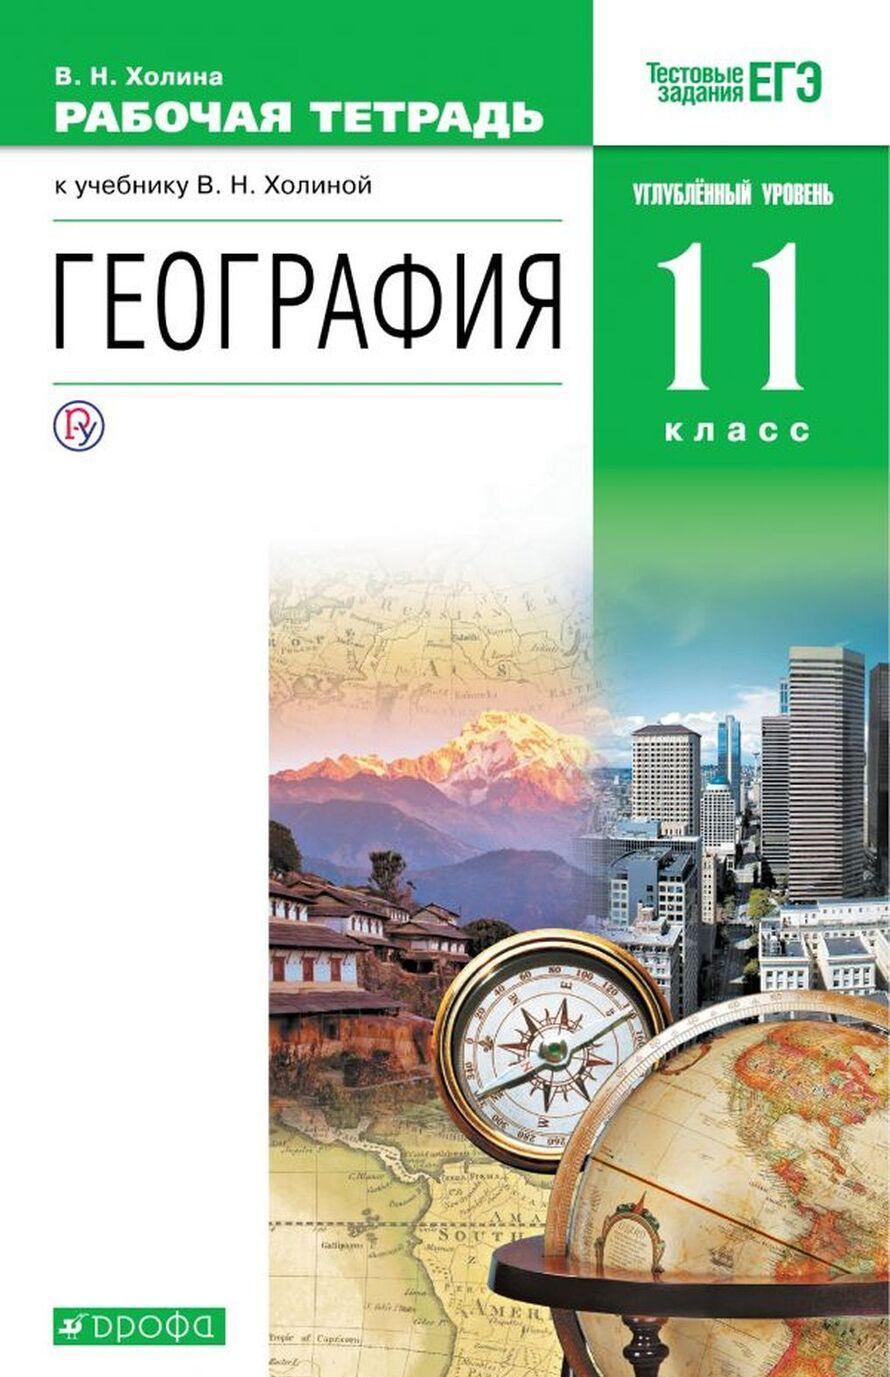 Geografija. 11 klass. Rabochaja tetrad. K uchebniku V. N. Kholinoj | Kholina Veronika Nikolaevna